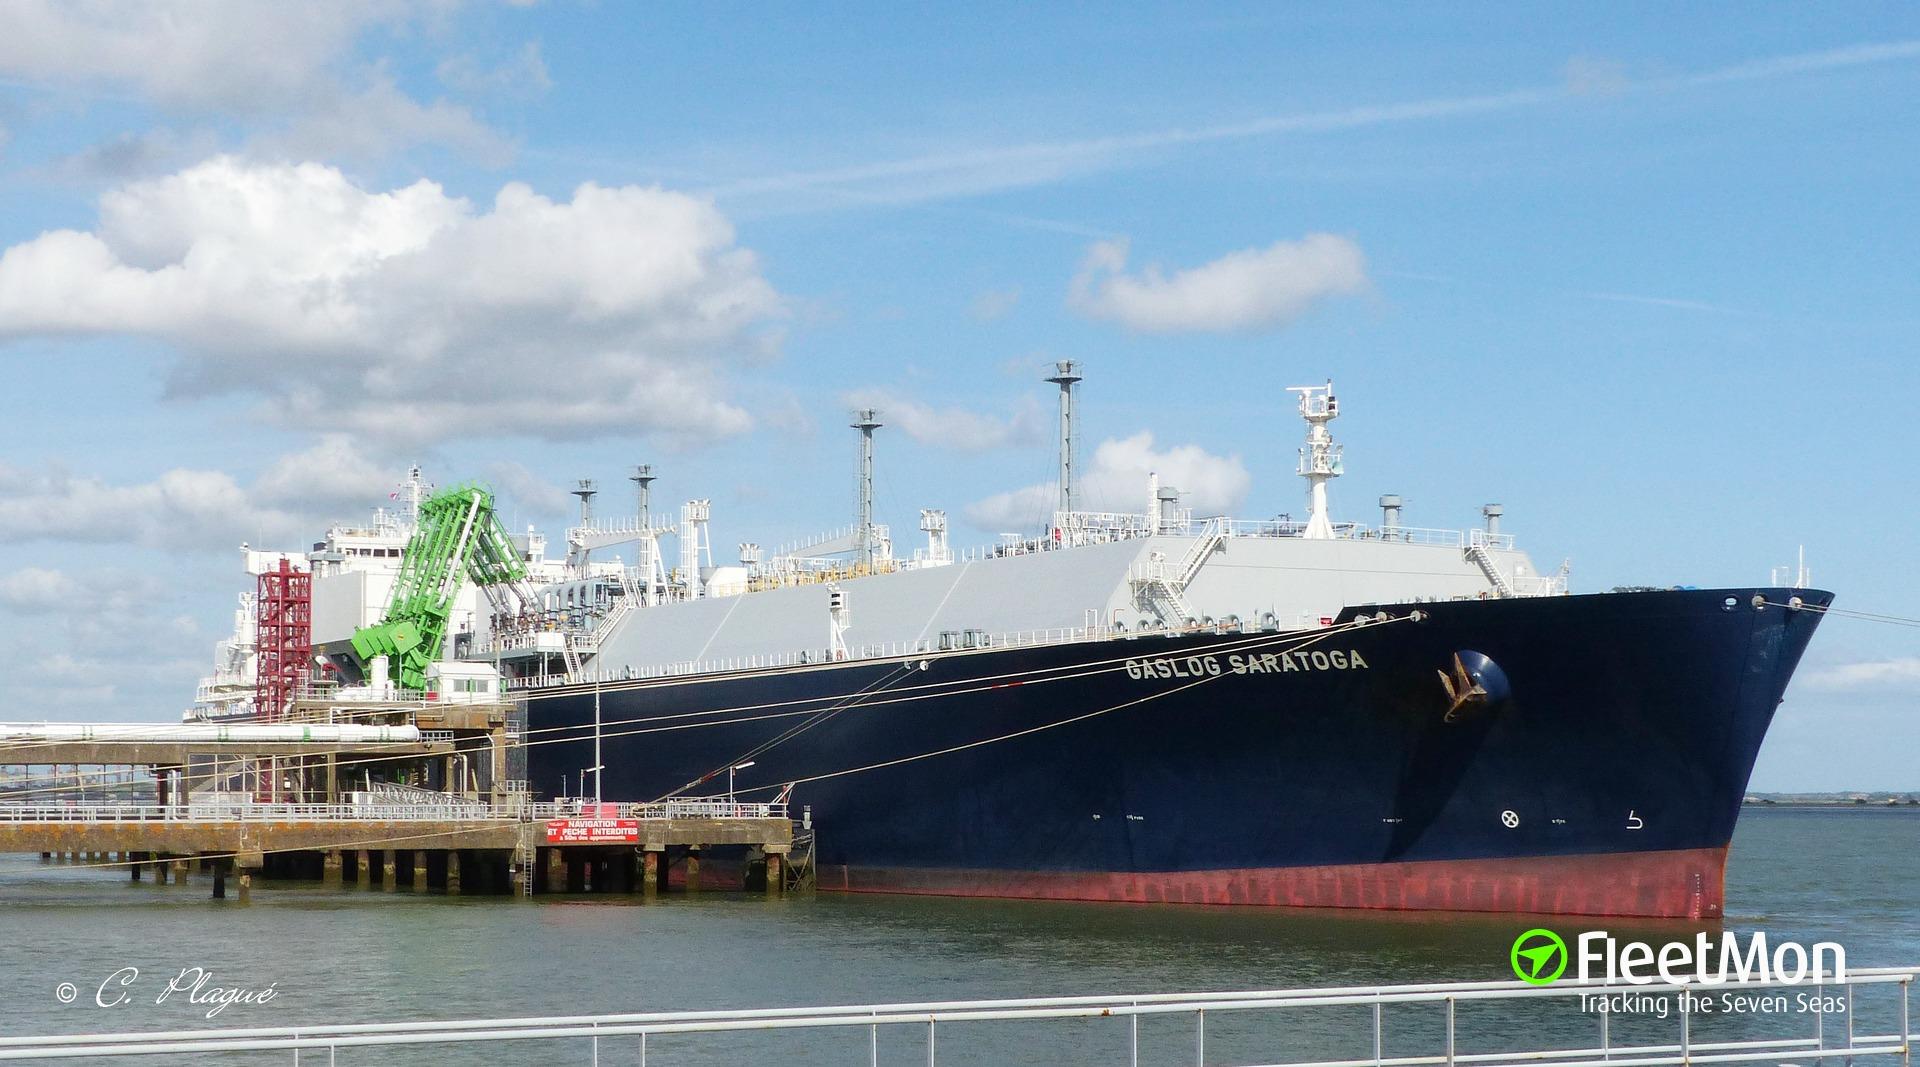 Bulk carrier struck barge, skipper missing, Vietnam